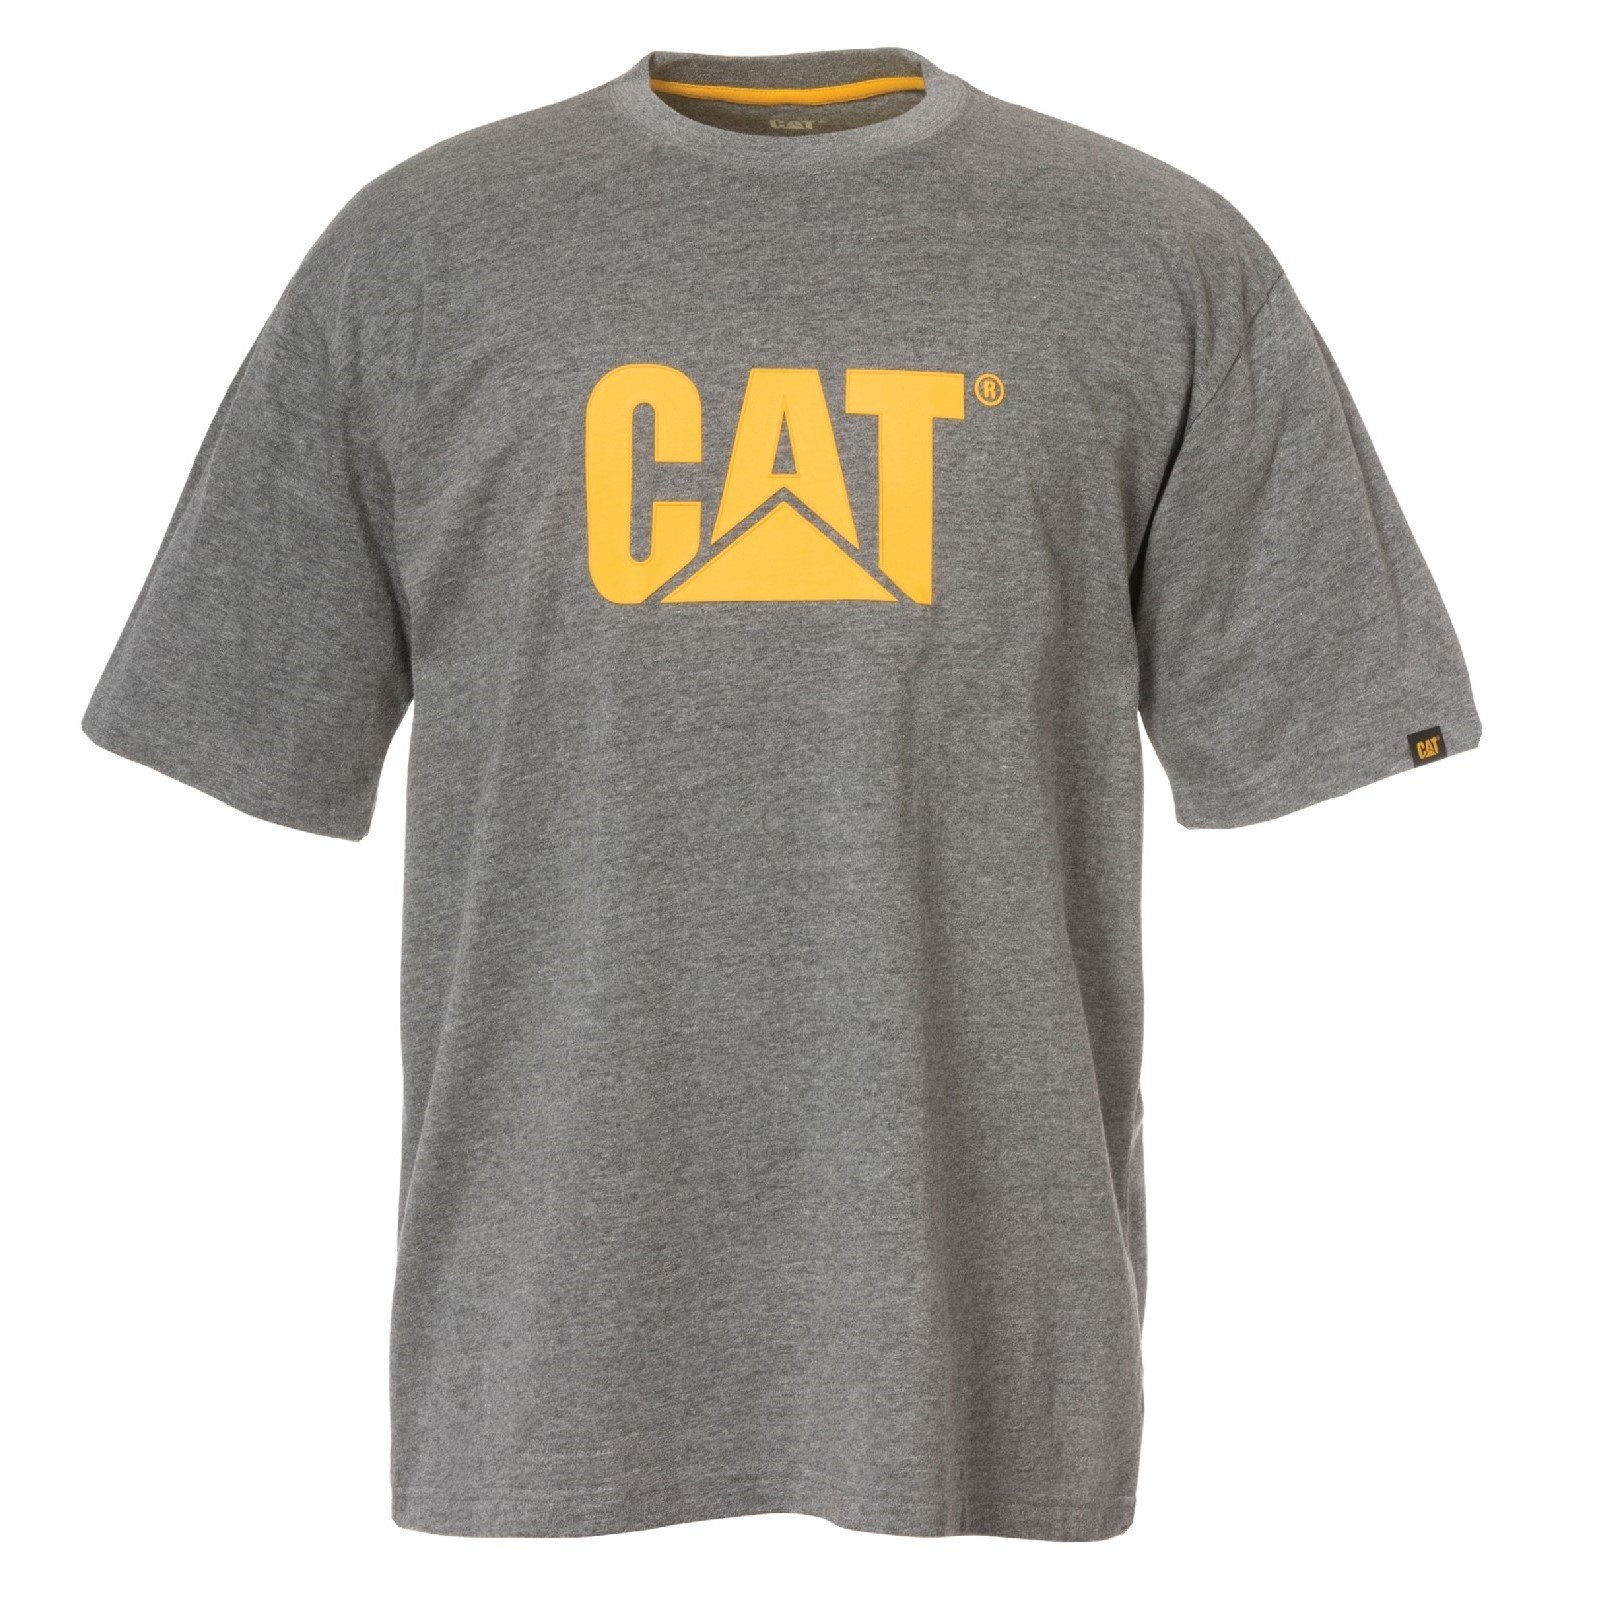 Caterpillar Men's Trademark Logo T-Shirt Various Colours 25301-42086 - Dark Heather Grey Lge